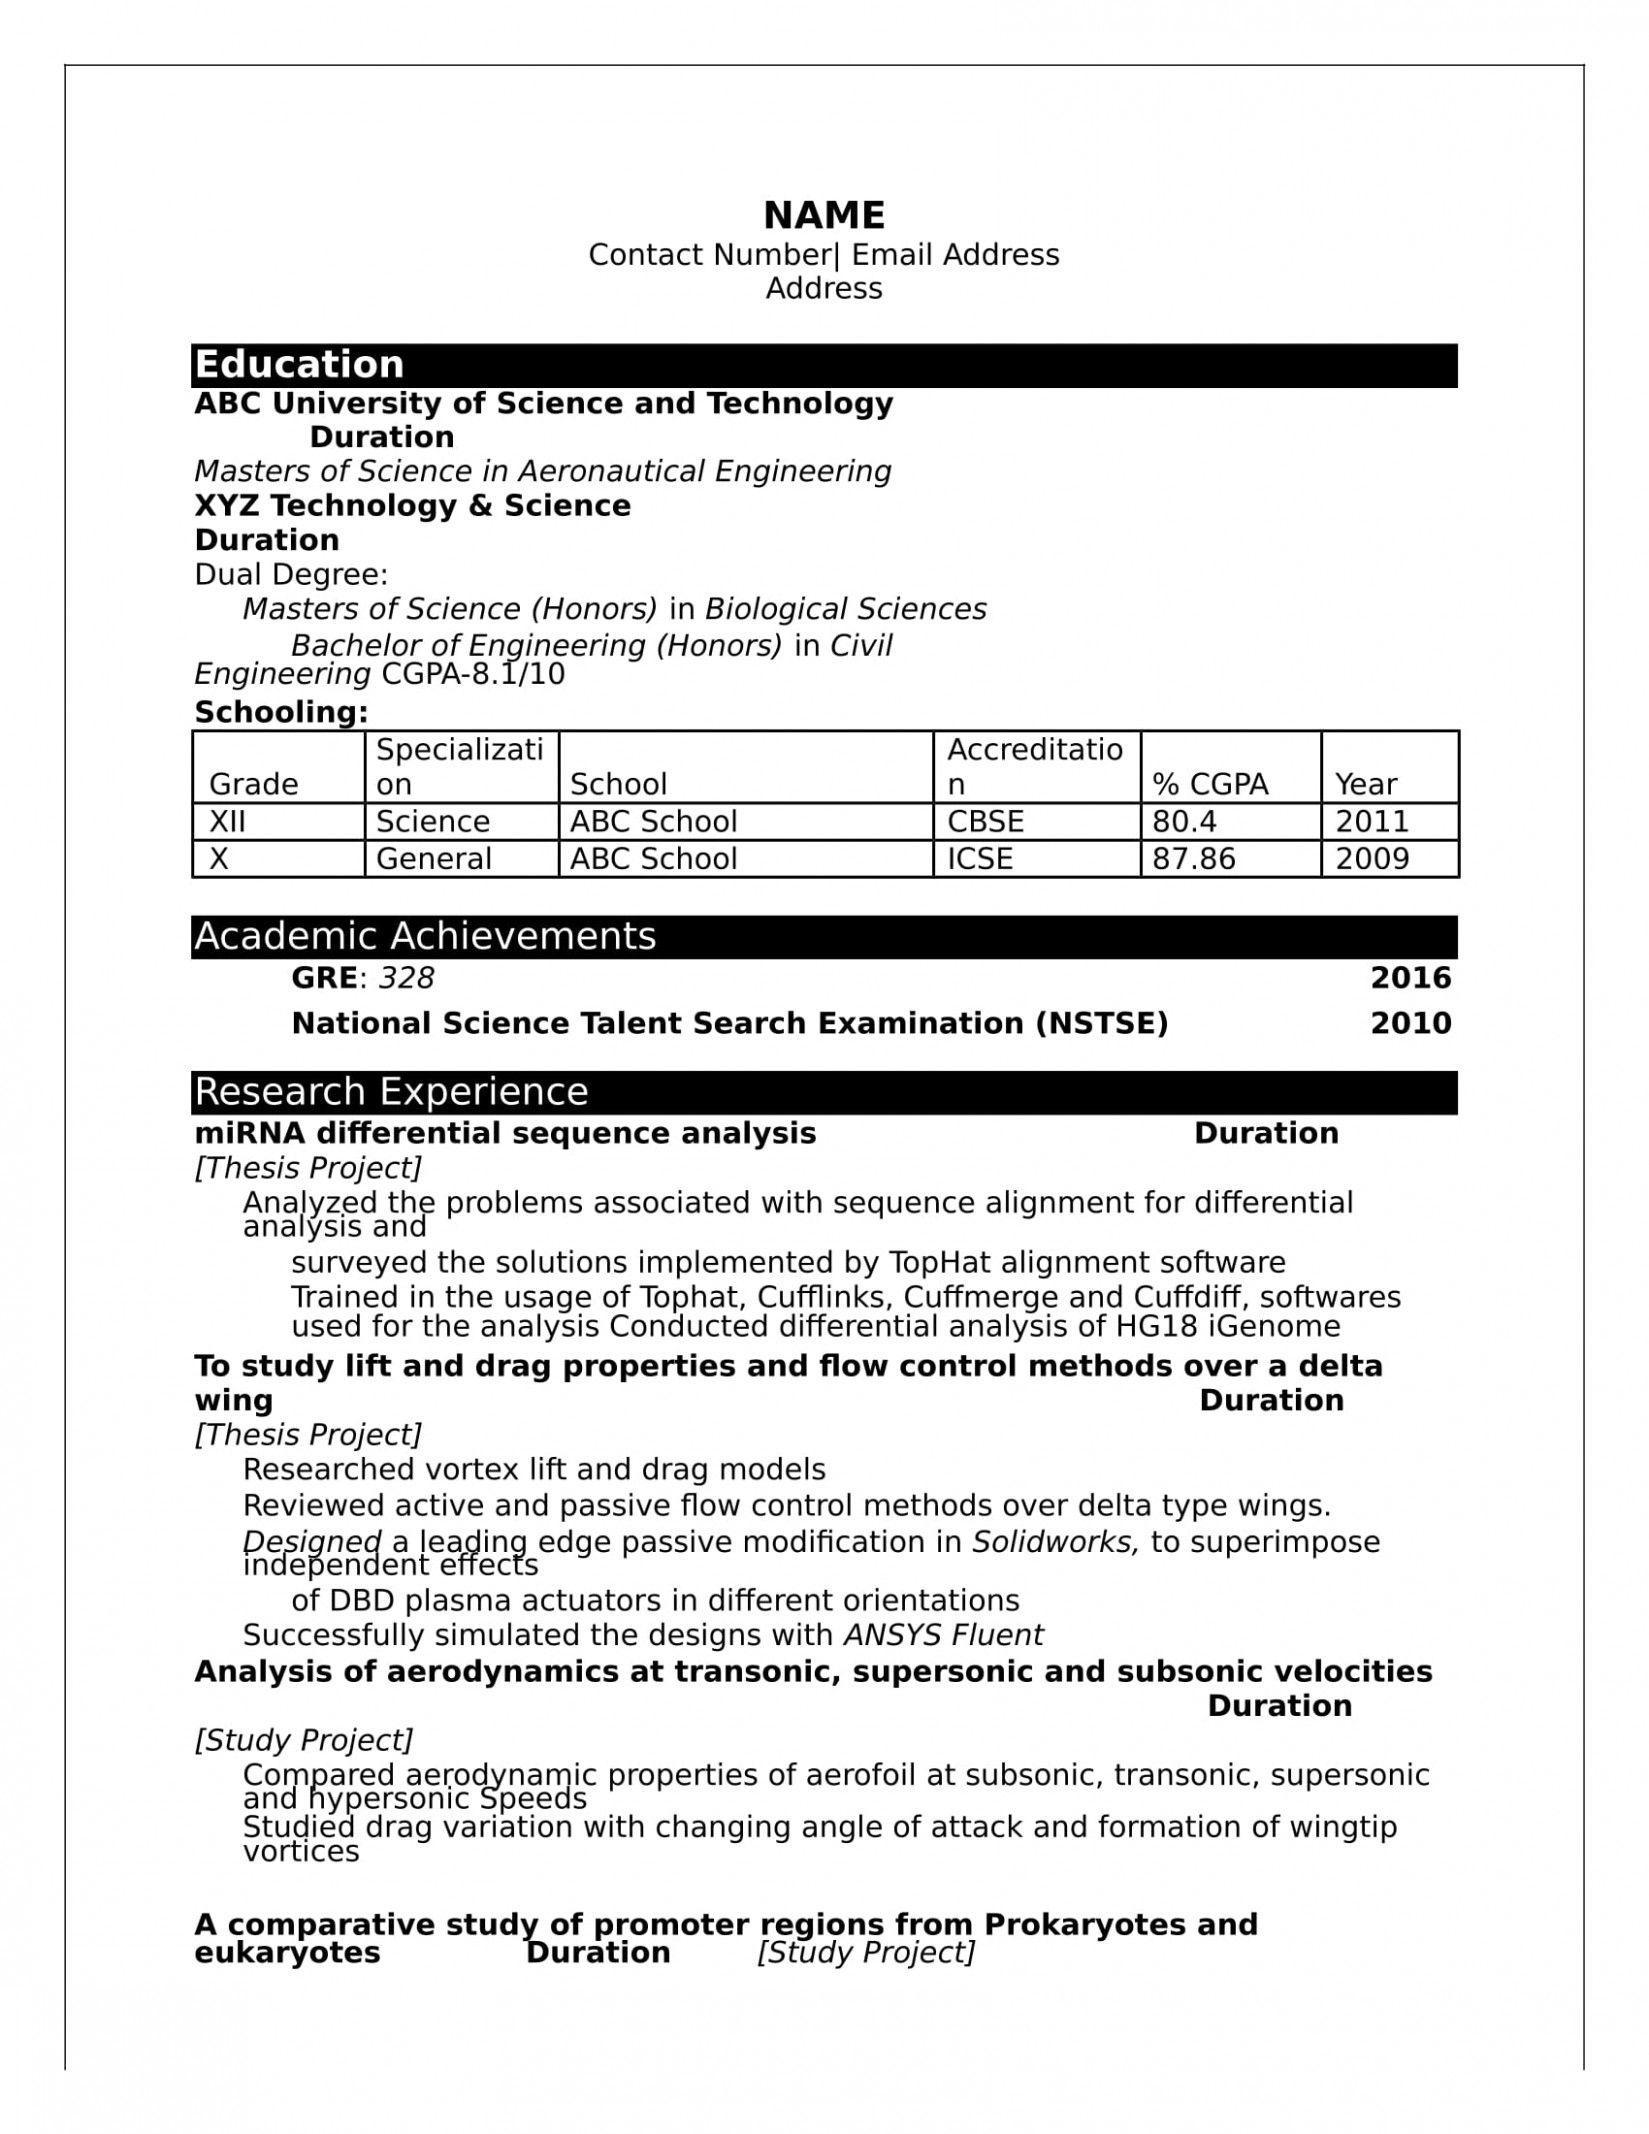 12 Bsc Brisker Resume Format Obtain in 2020 Engineering